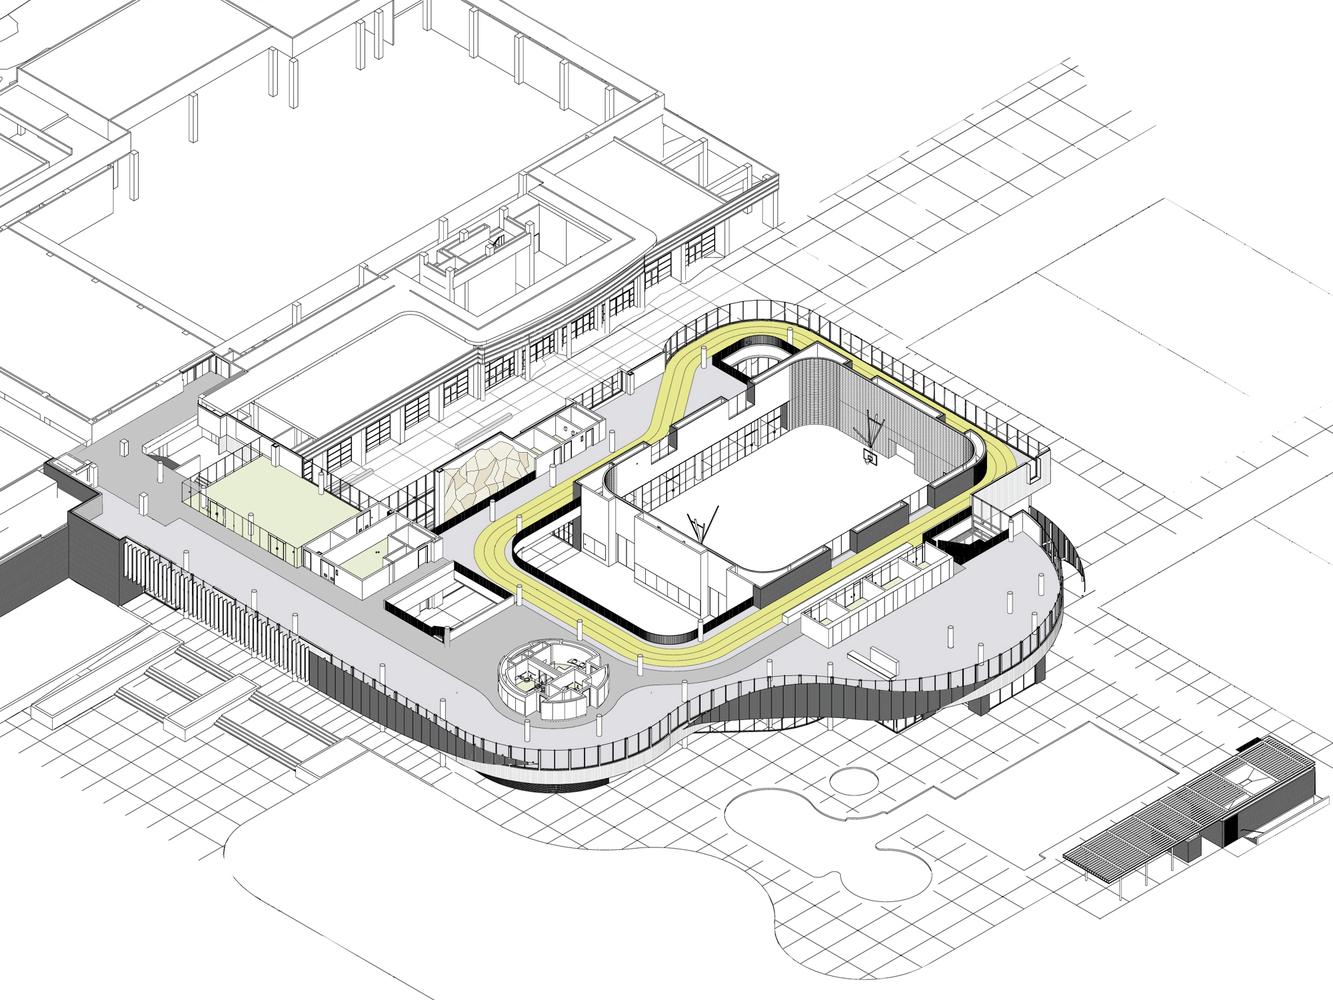 University Of California Riverside Student Recreation Center Expansion /  Cannon Design,axonometric Floor Plan 02